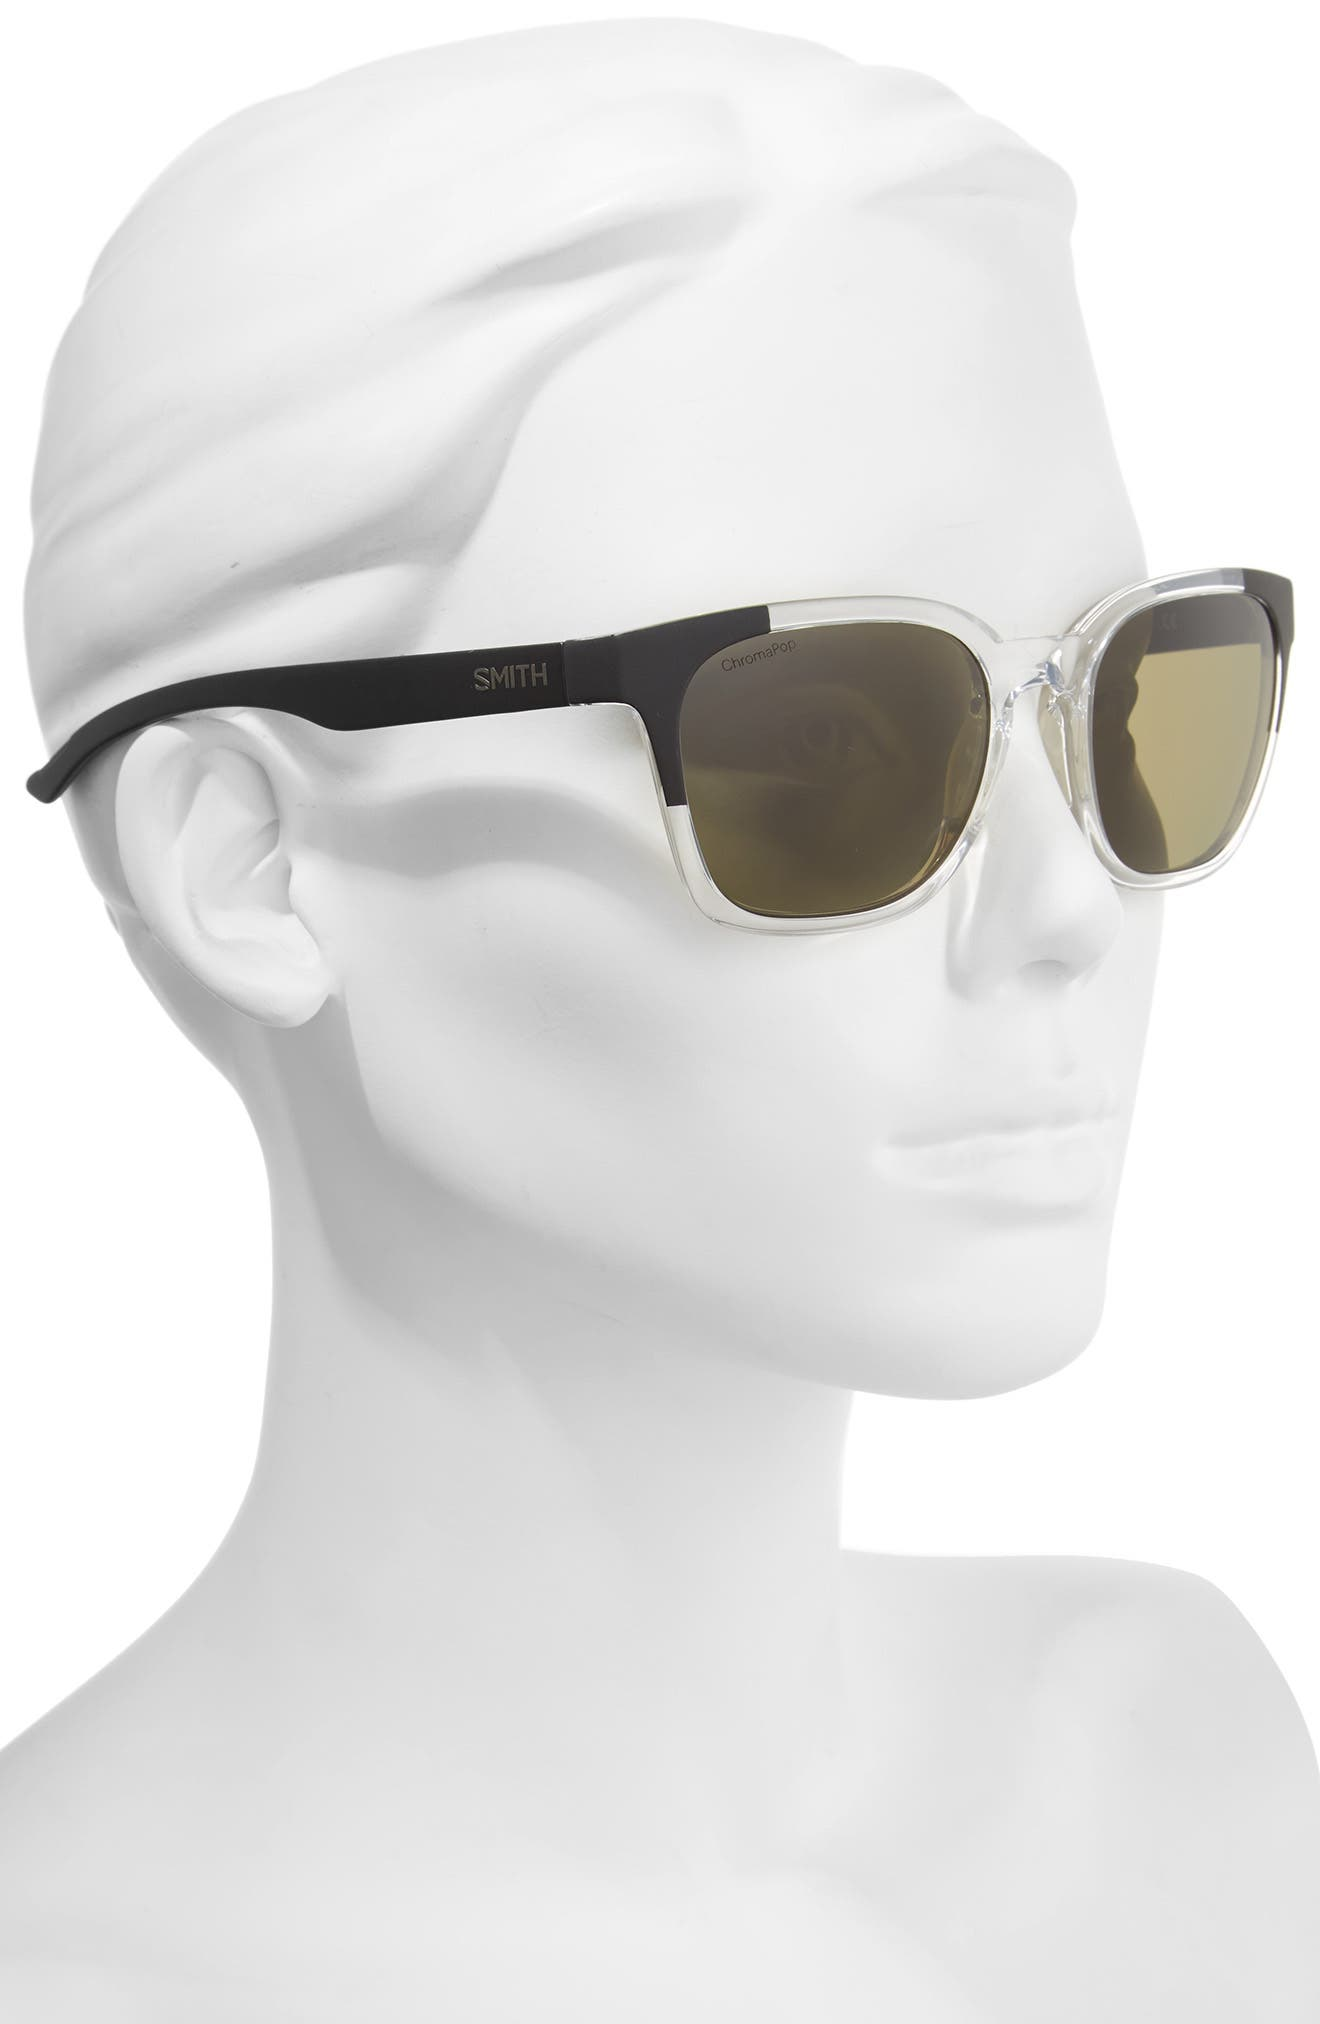 Founder 56mm ChromaPop Polarized Sunglasses,                             Alternate thumbnail 4, color,